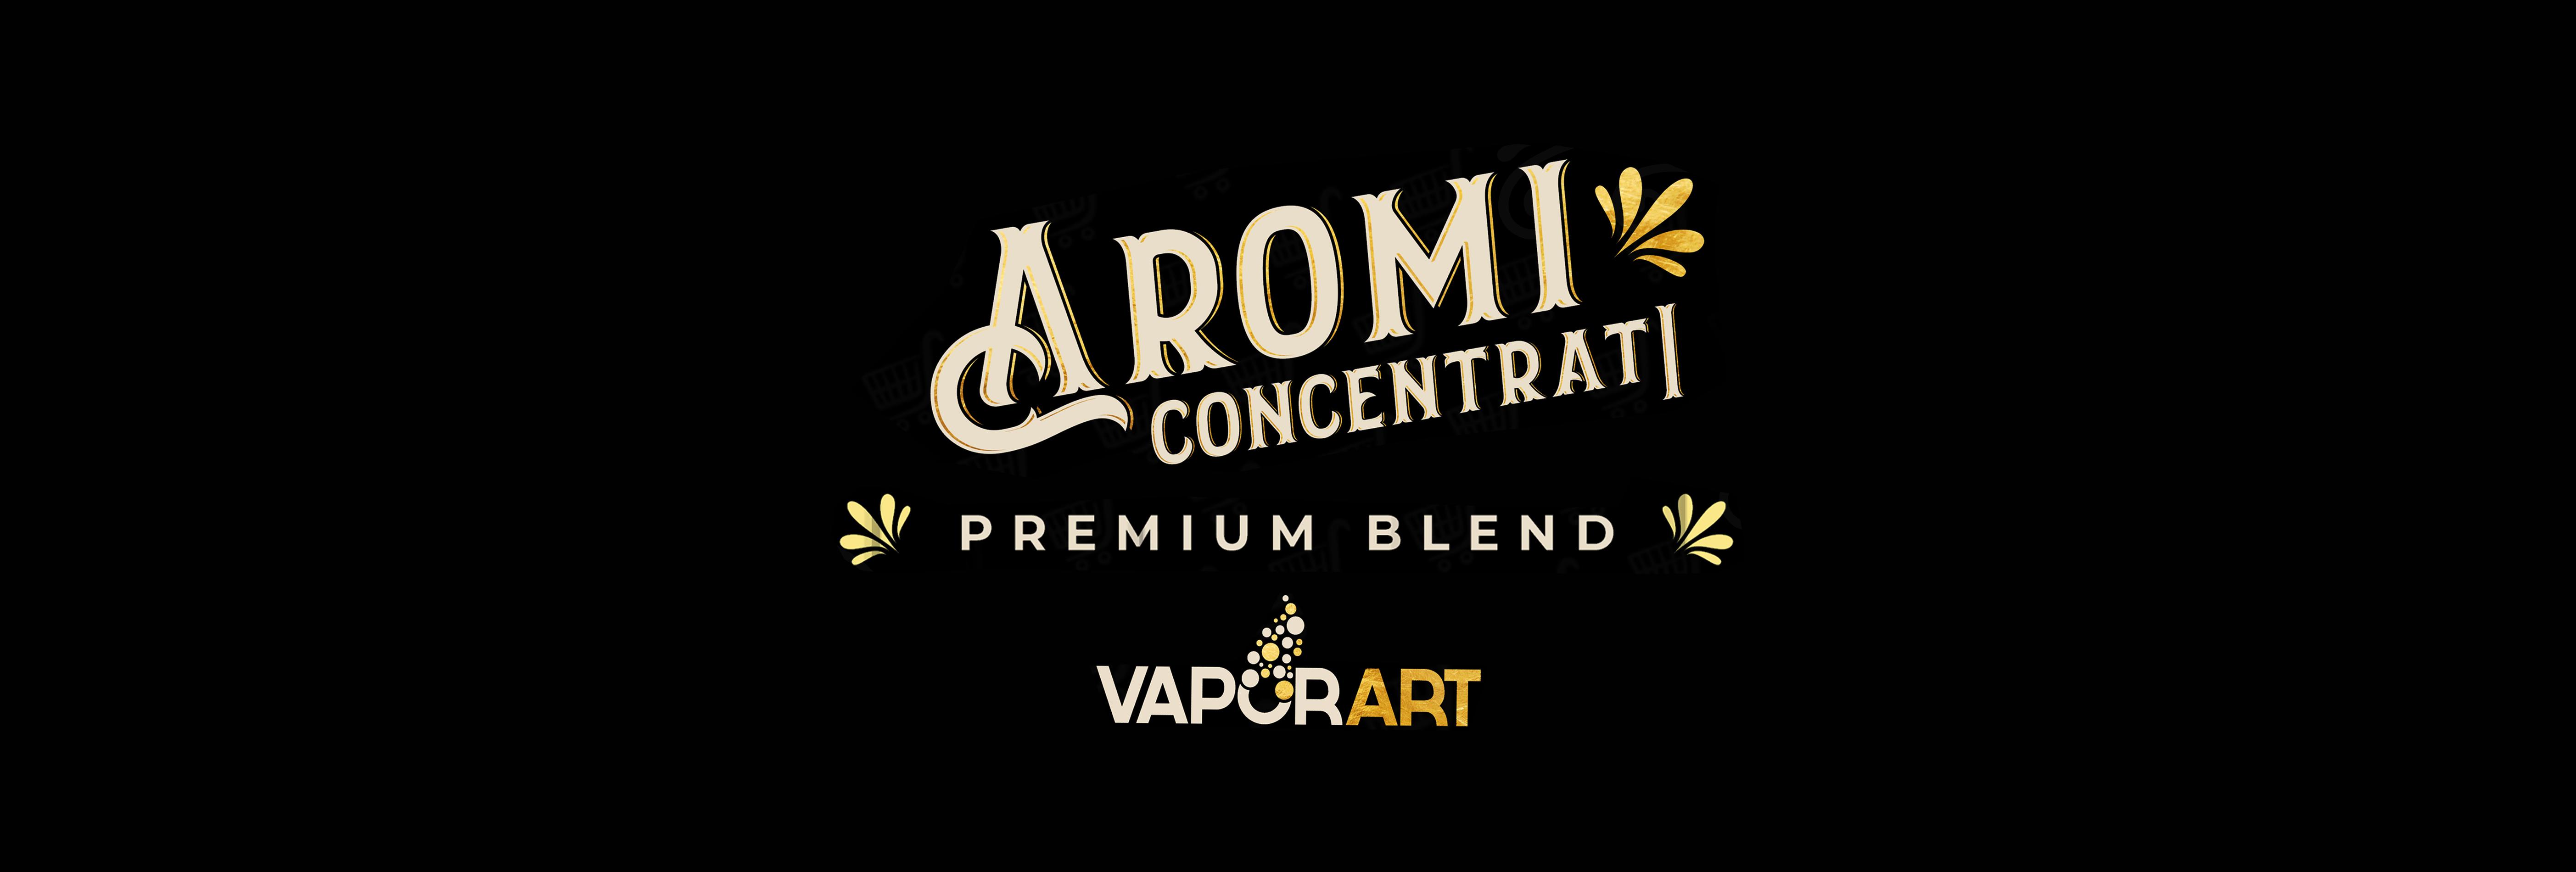 Vaporart premium blend